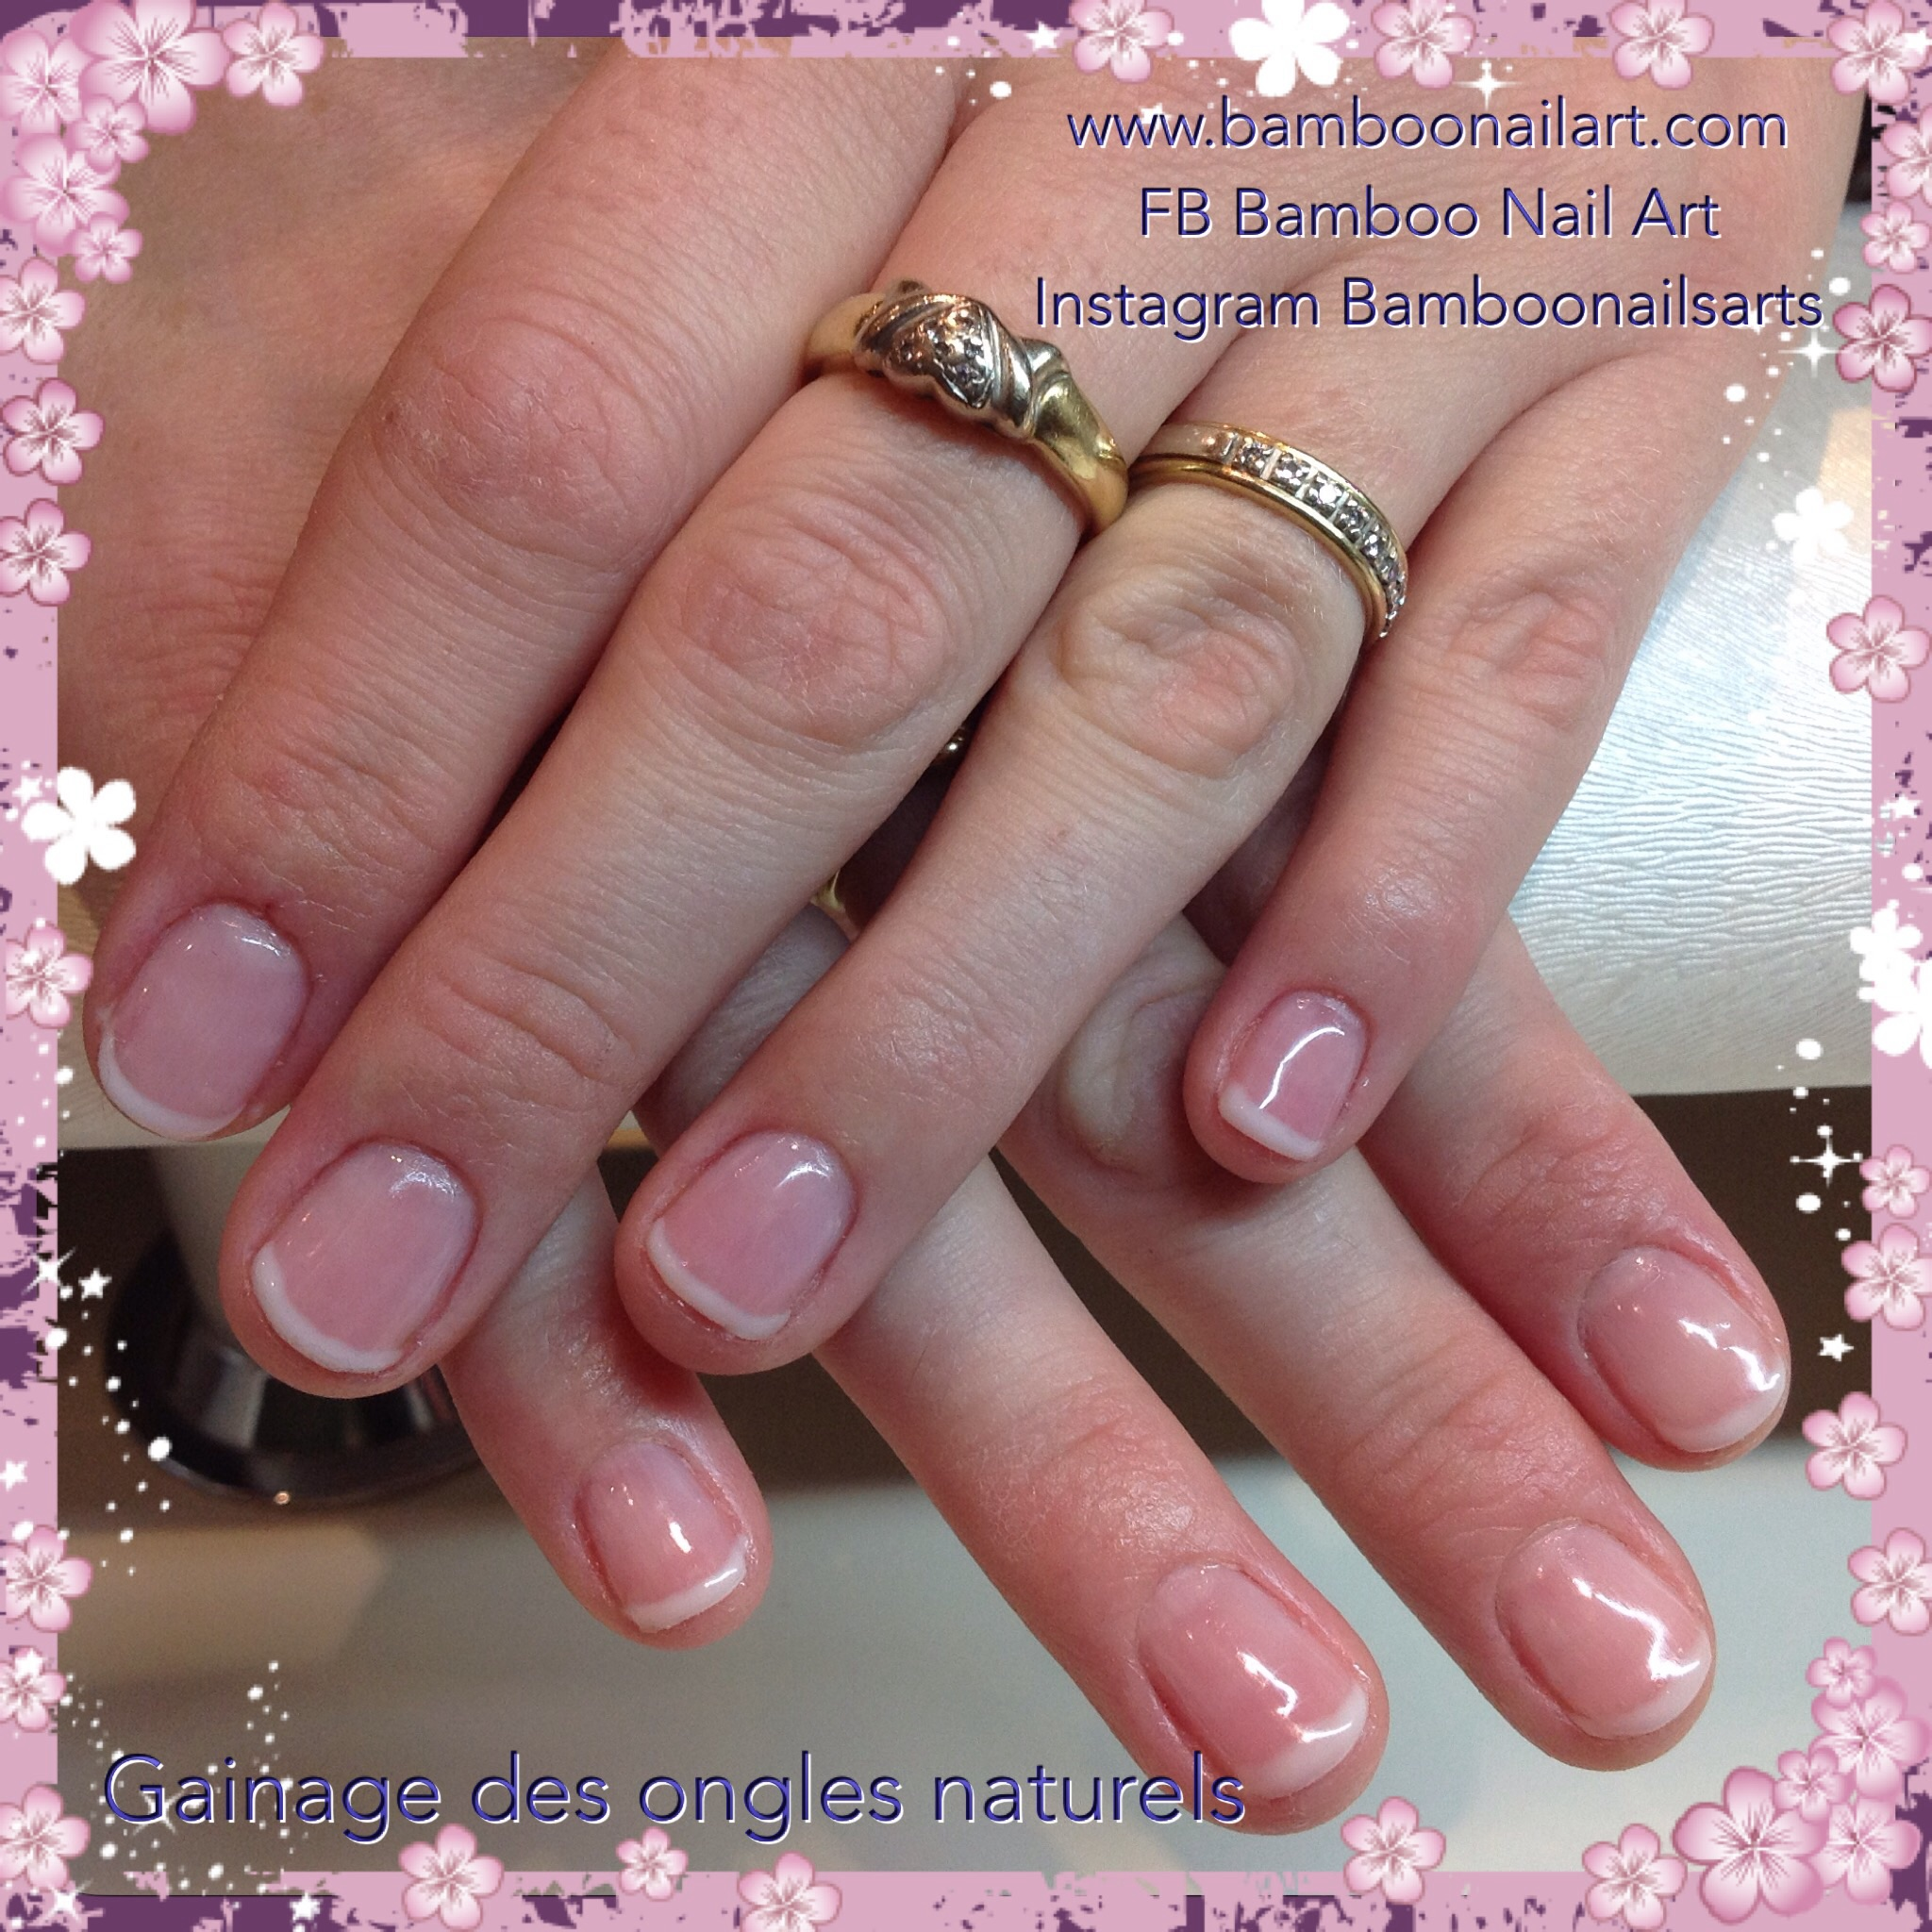 Mes tarifs bamboo nail art - Modele dessin ongle gratuit ...